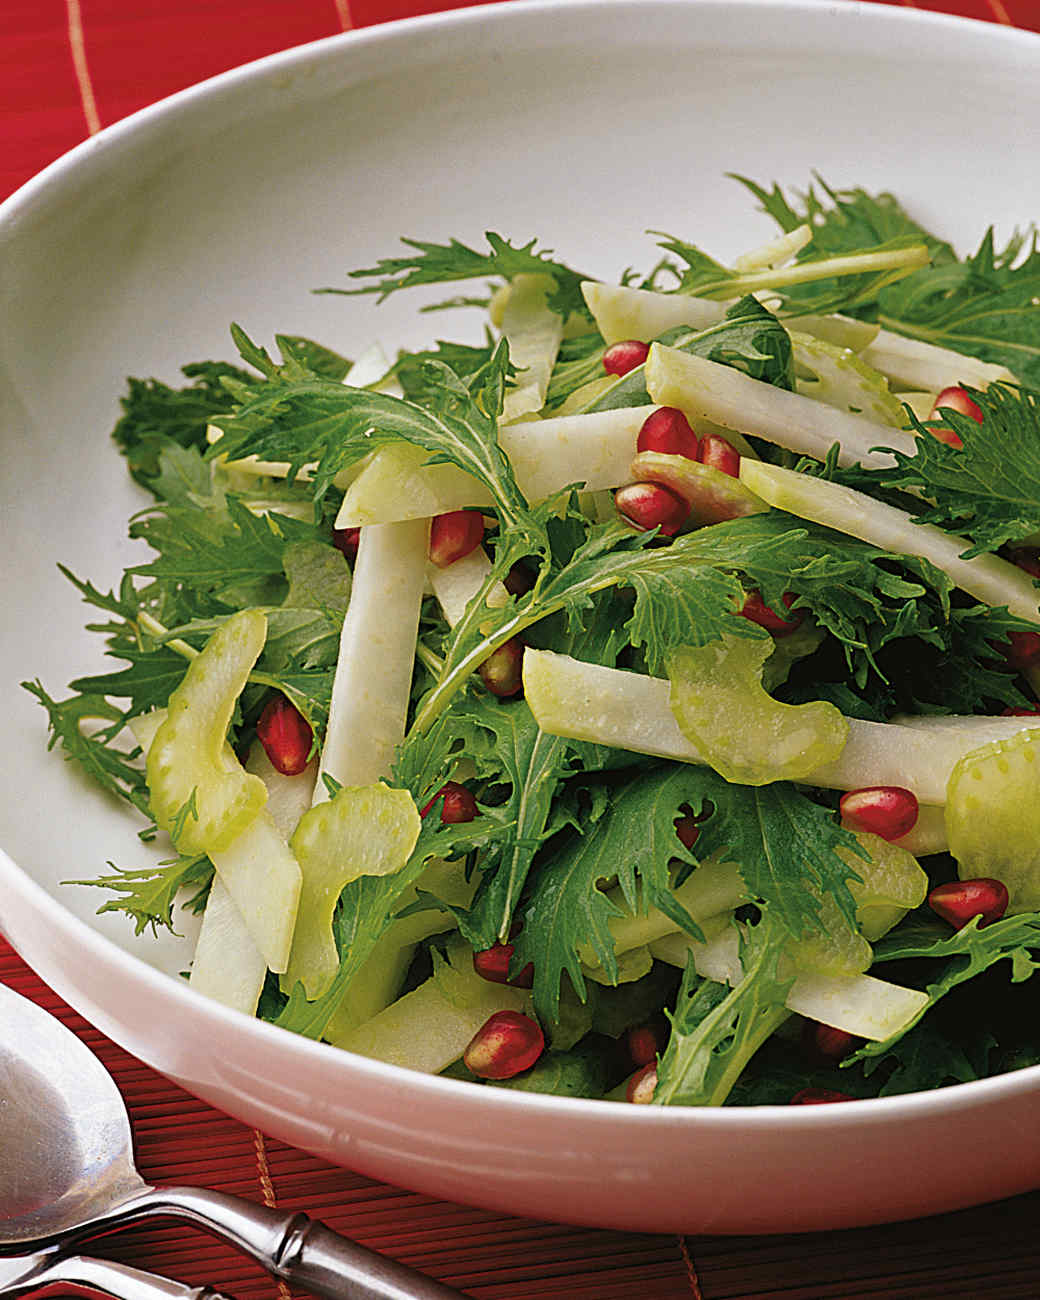 Mizuna Salad with Kohlrabi and Pomegranate Seeds